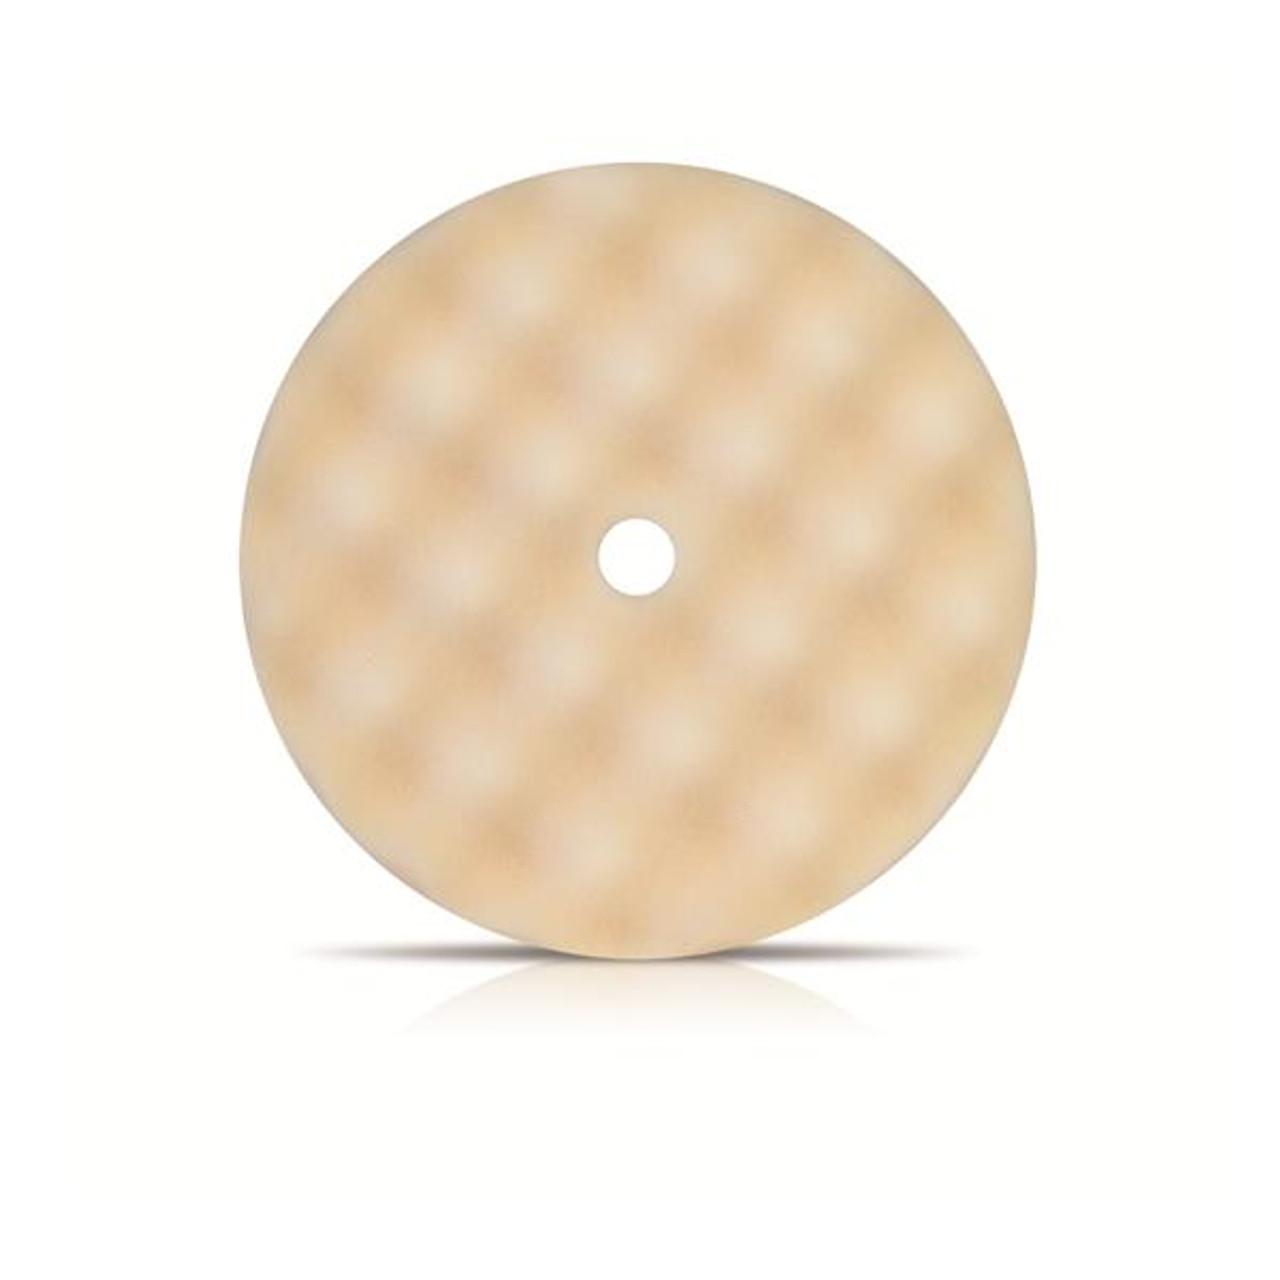 Buff and Shine 899WG White Waffle Pad